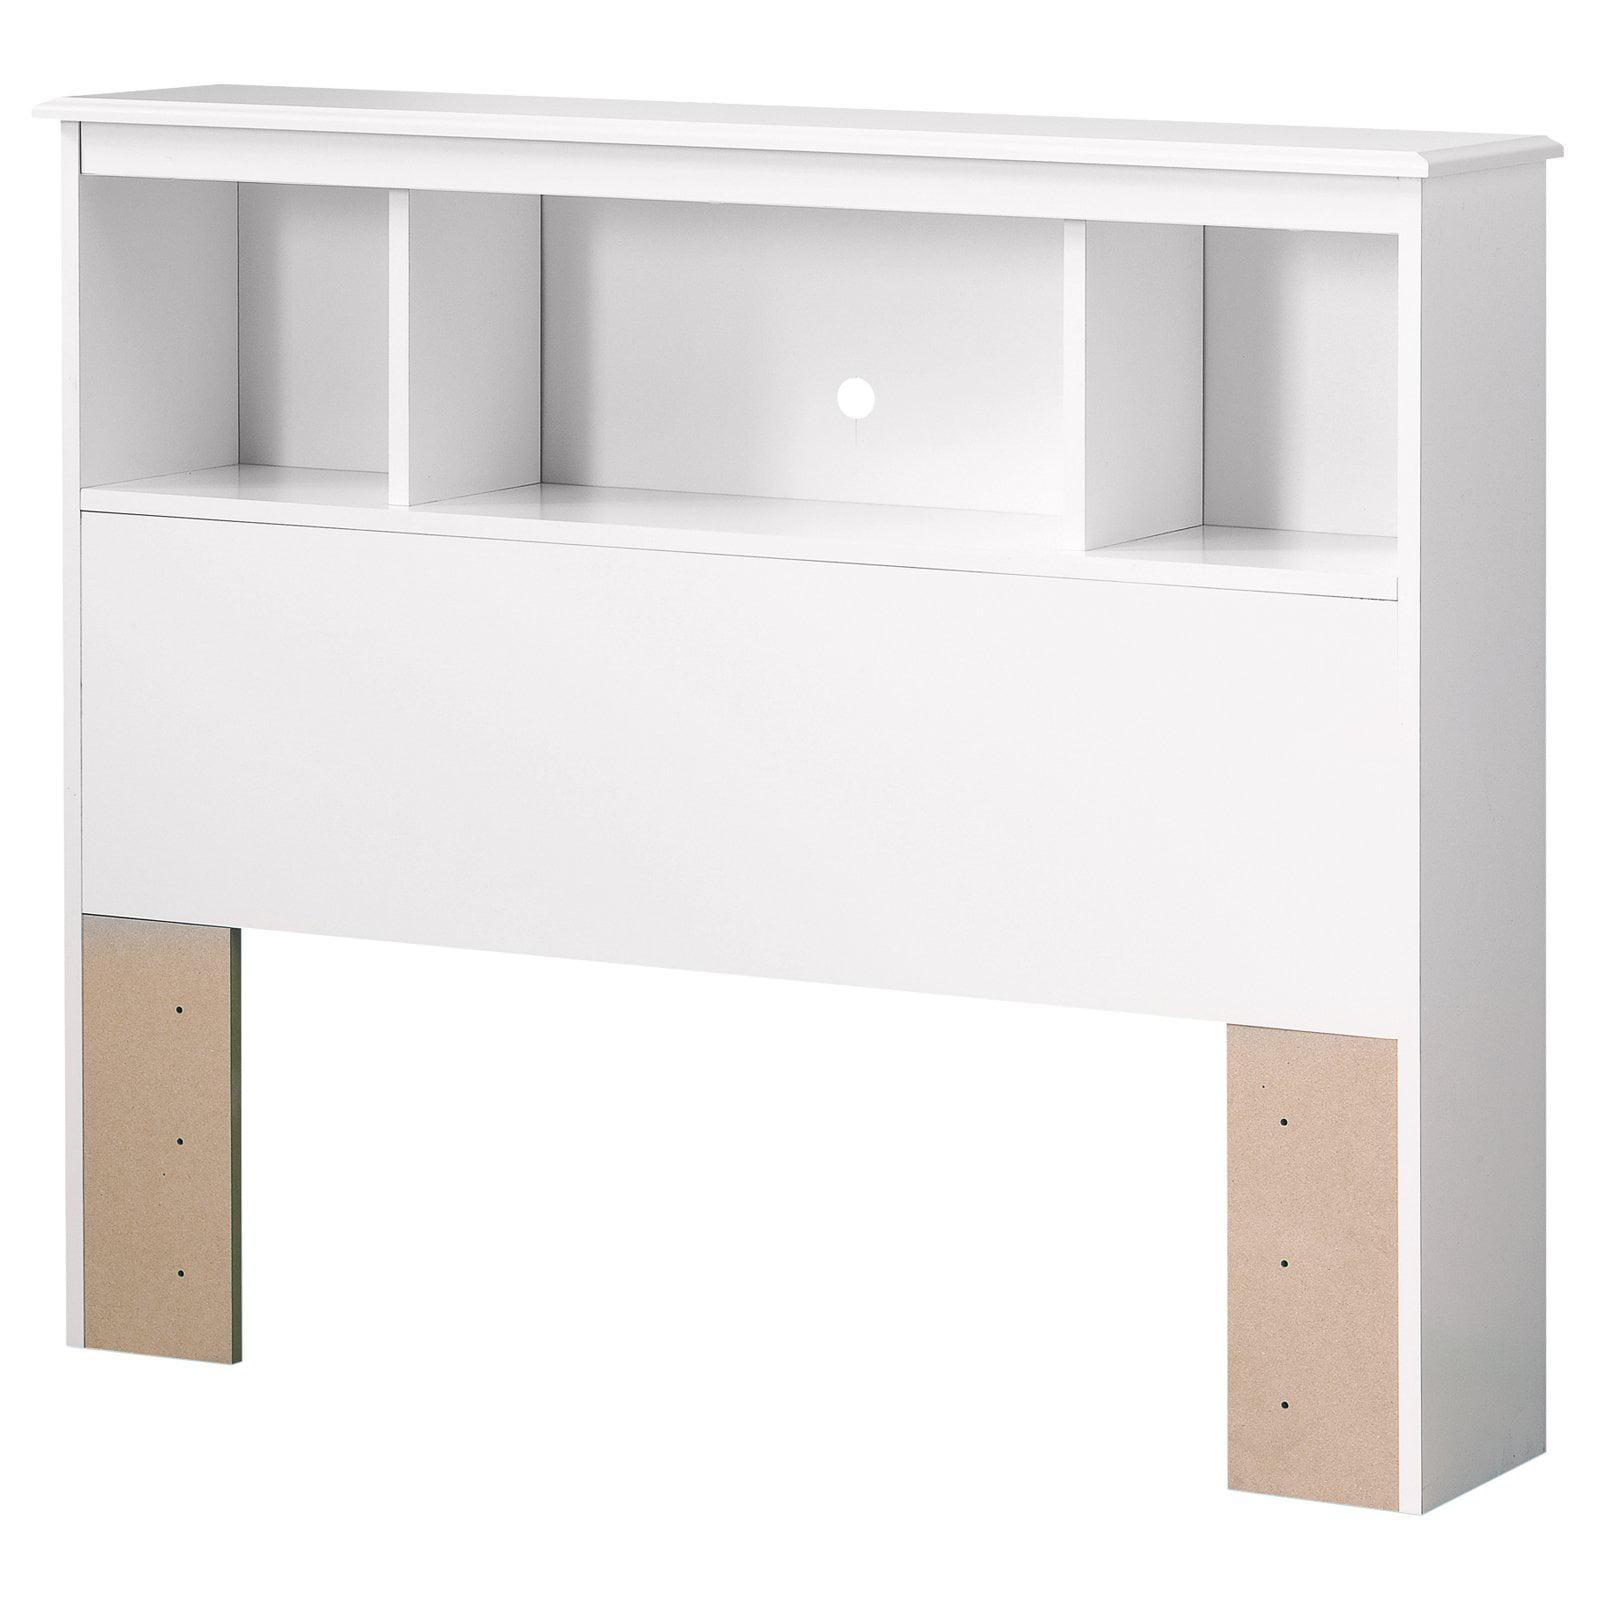 South Shore Crystal 3-Shelf Bookcase Headboard, Twin, White